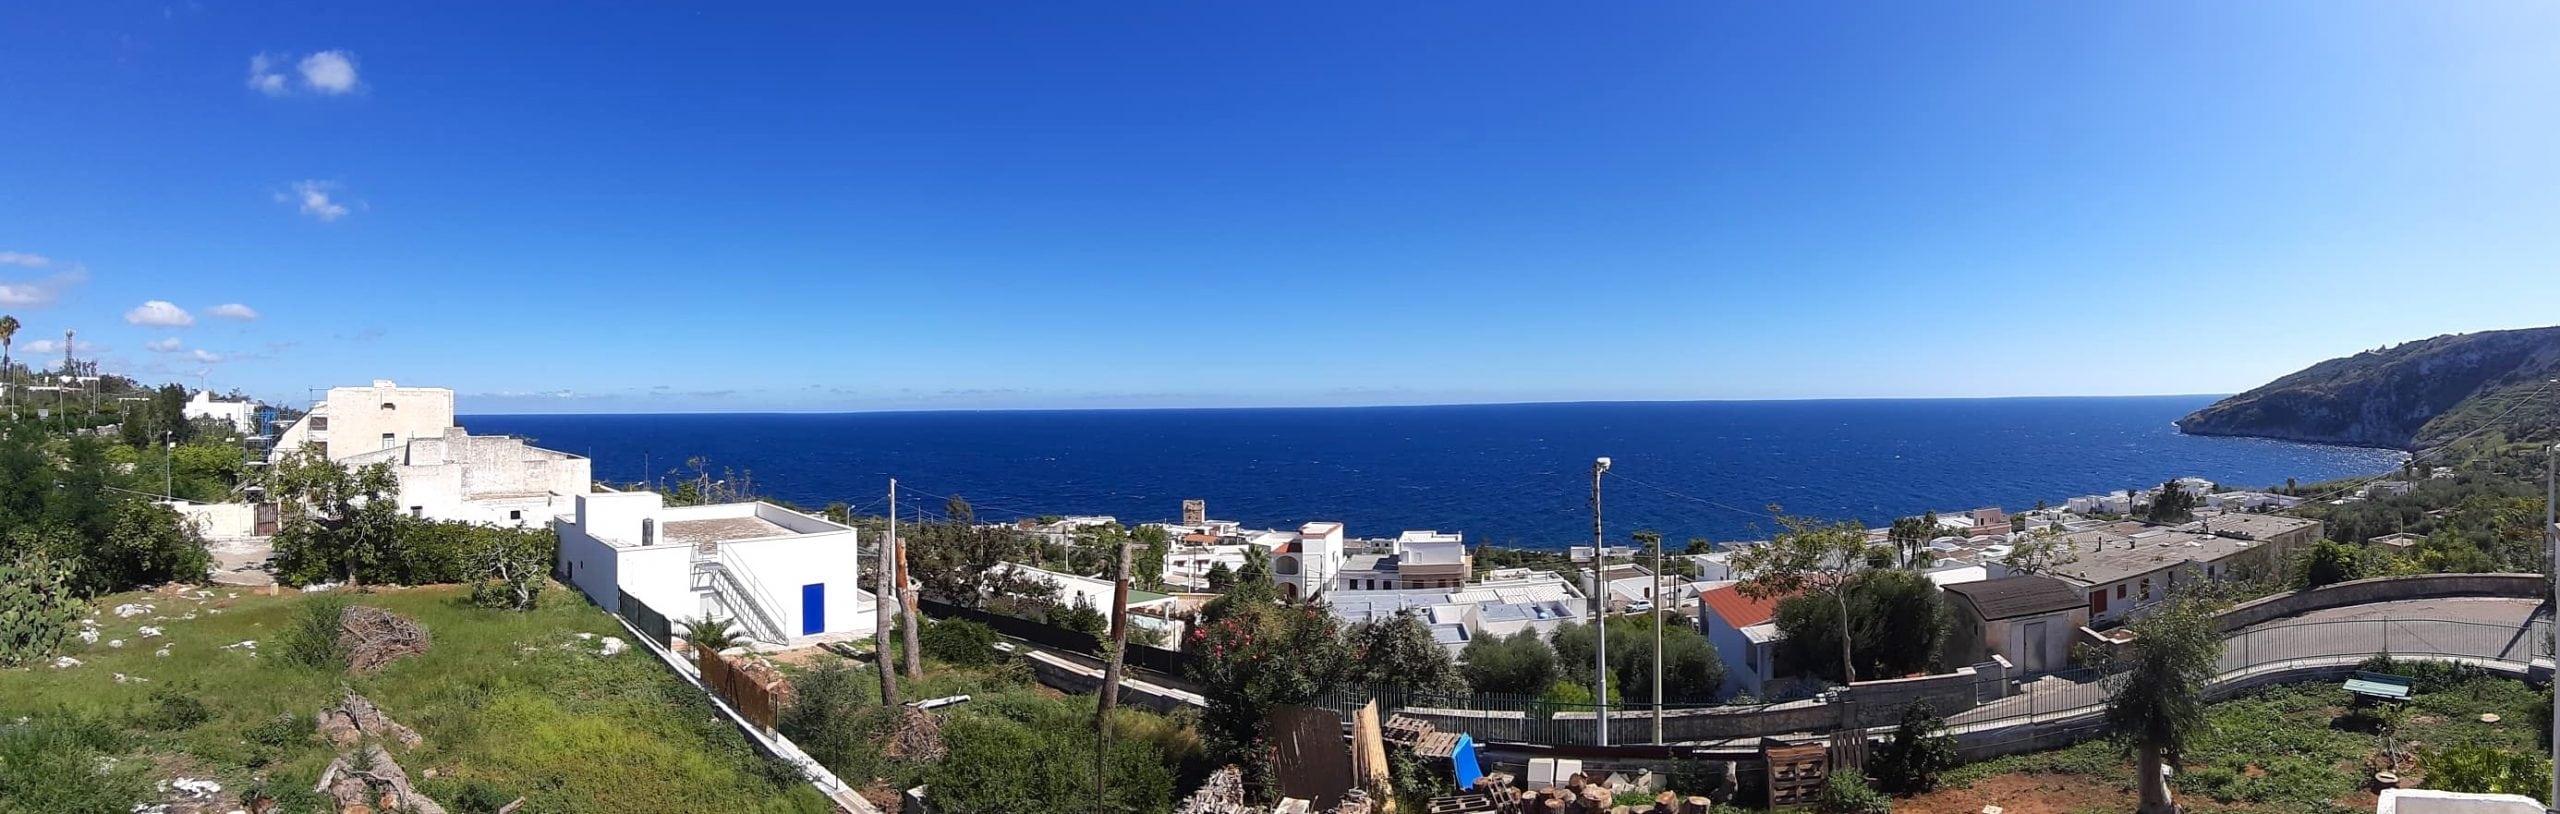 View from Celacanto Credit Dragan Dekic